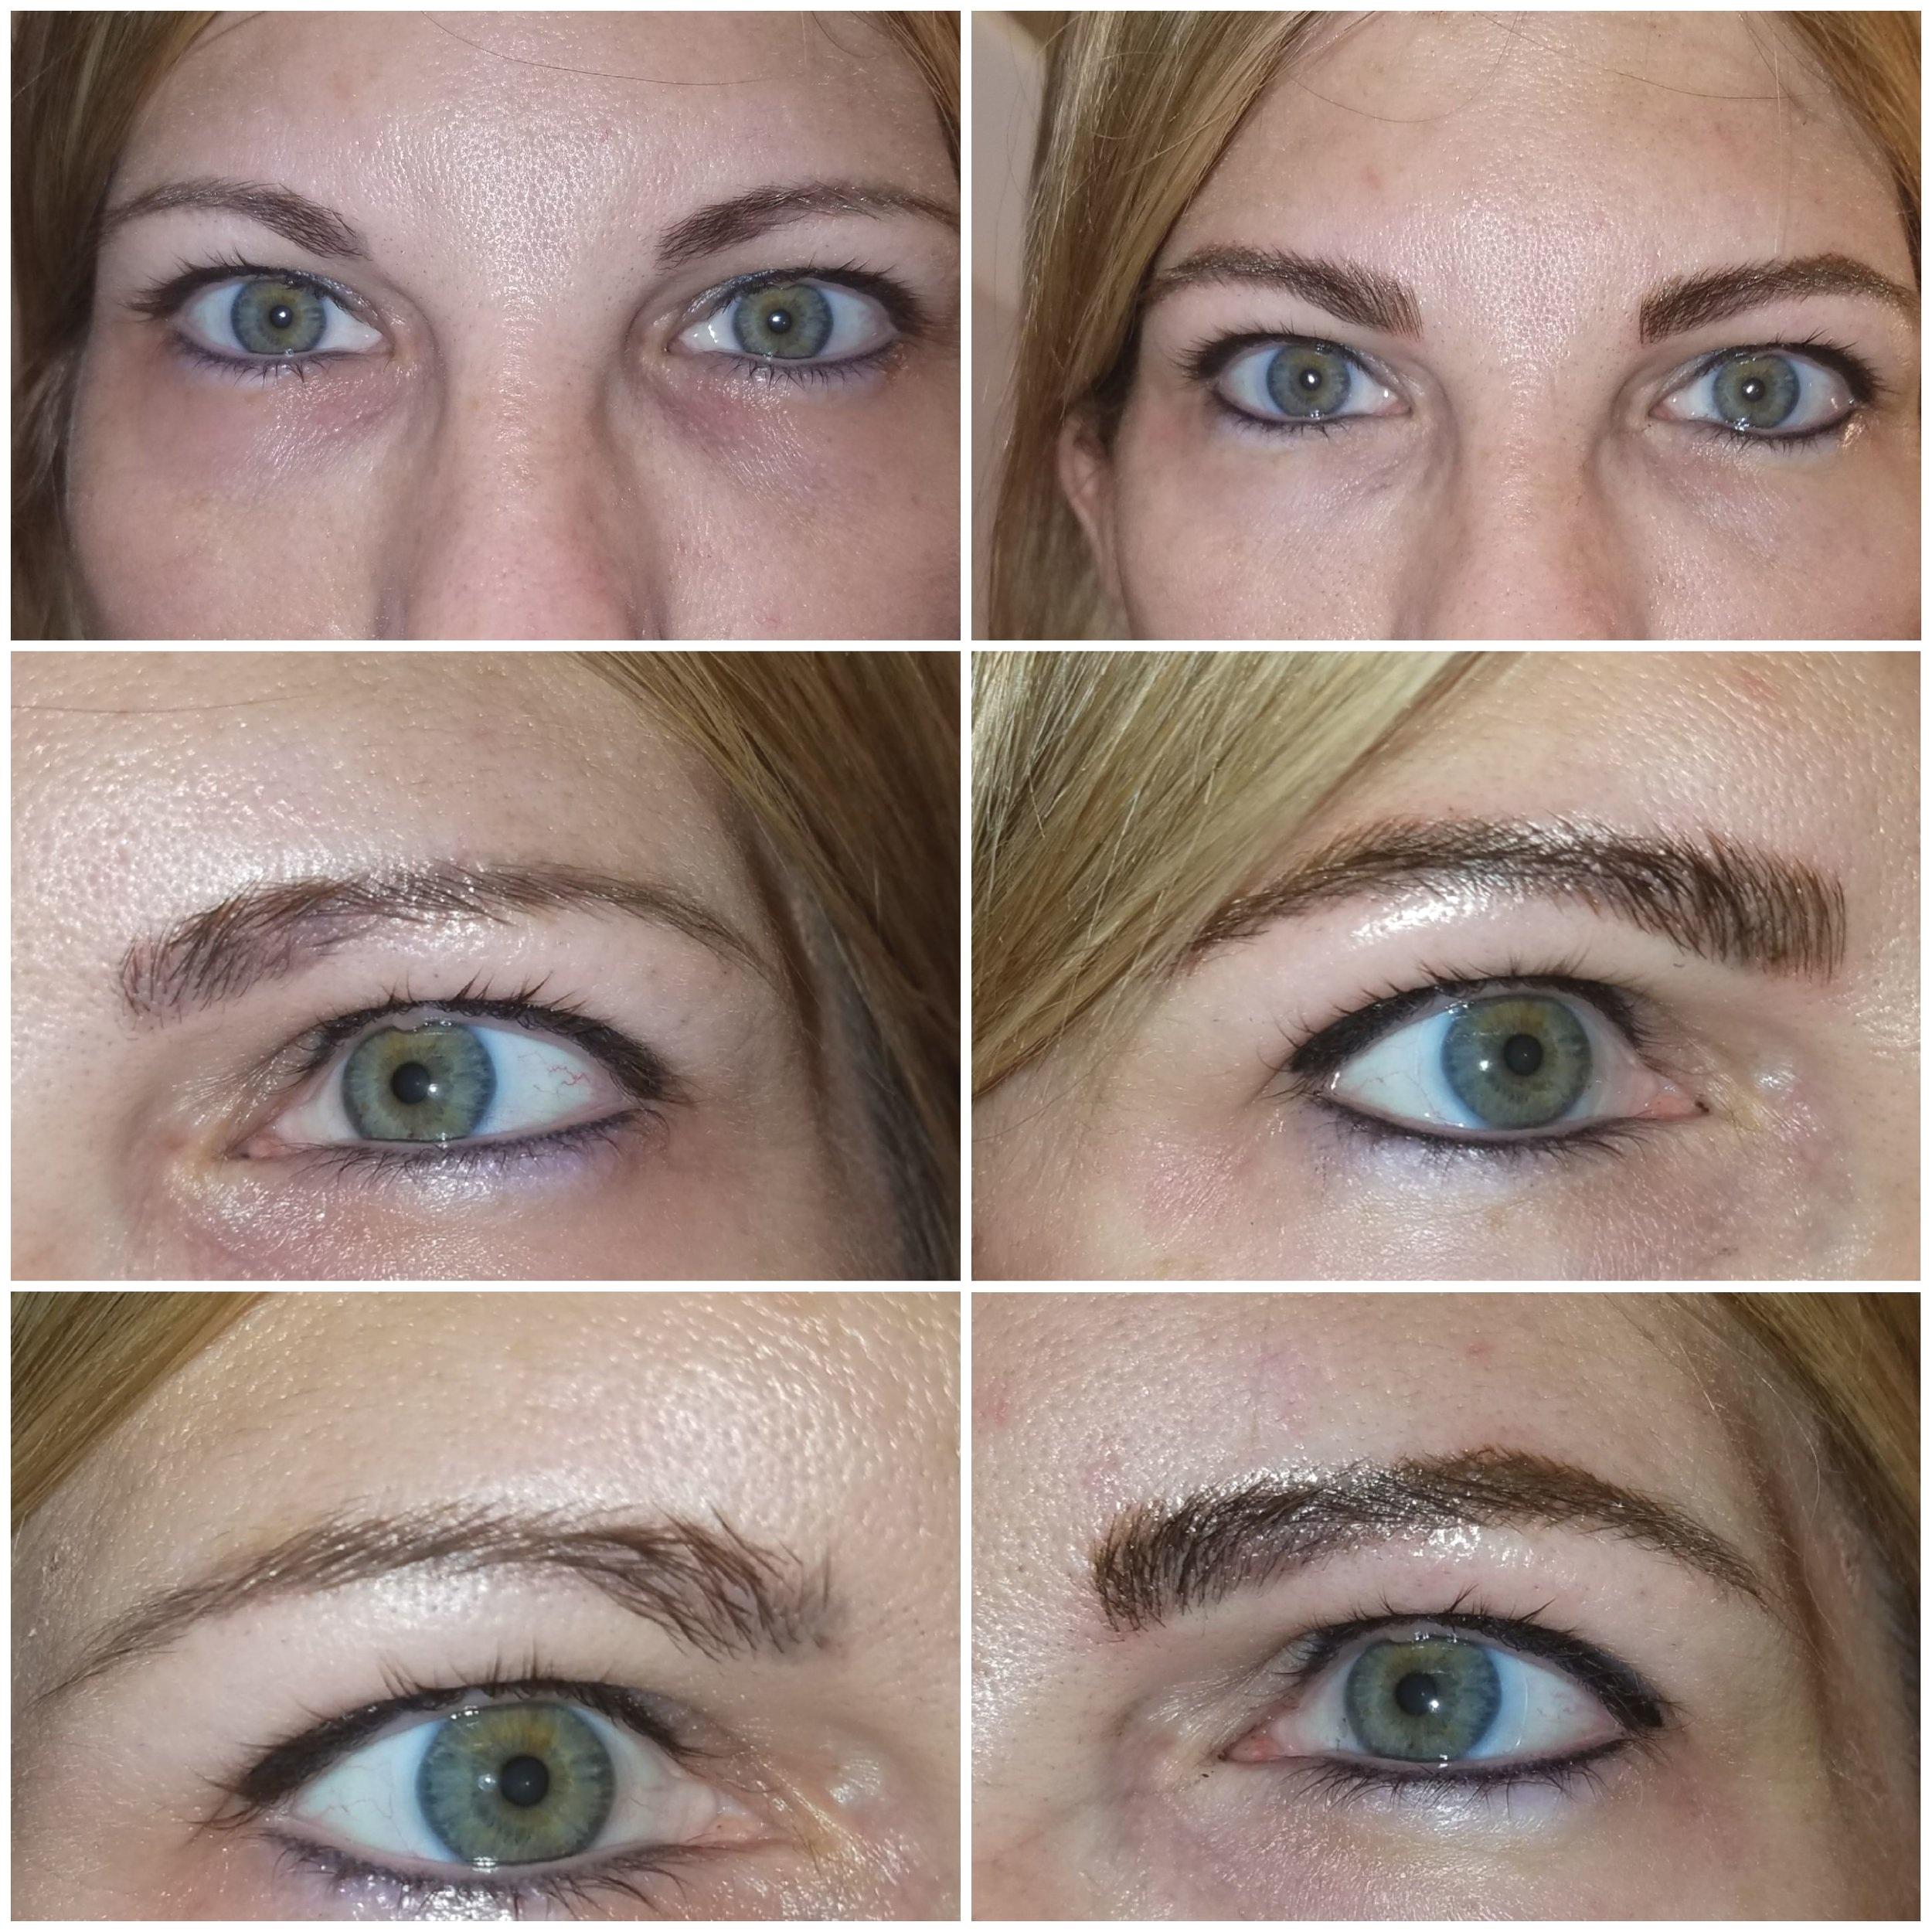 Envy PMU Eyeliner and Microblading